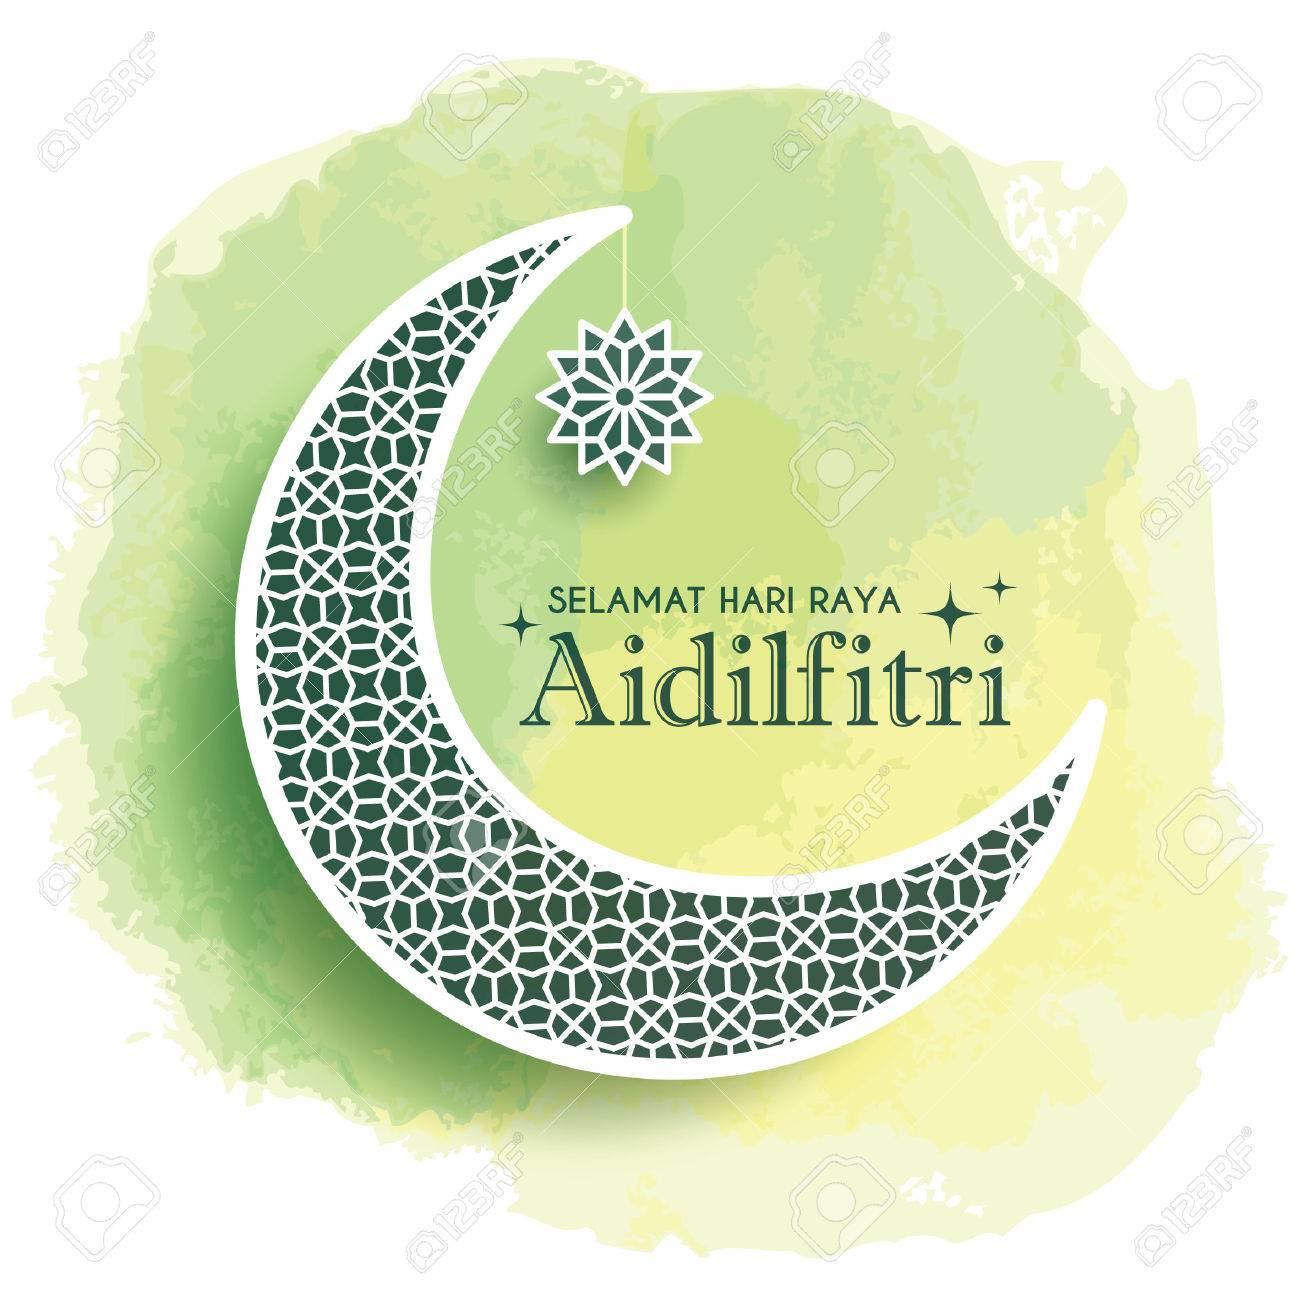 Hari Raya Aidilfitri Greeting Card Template Design Decorative